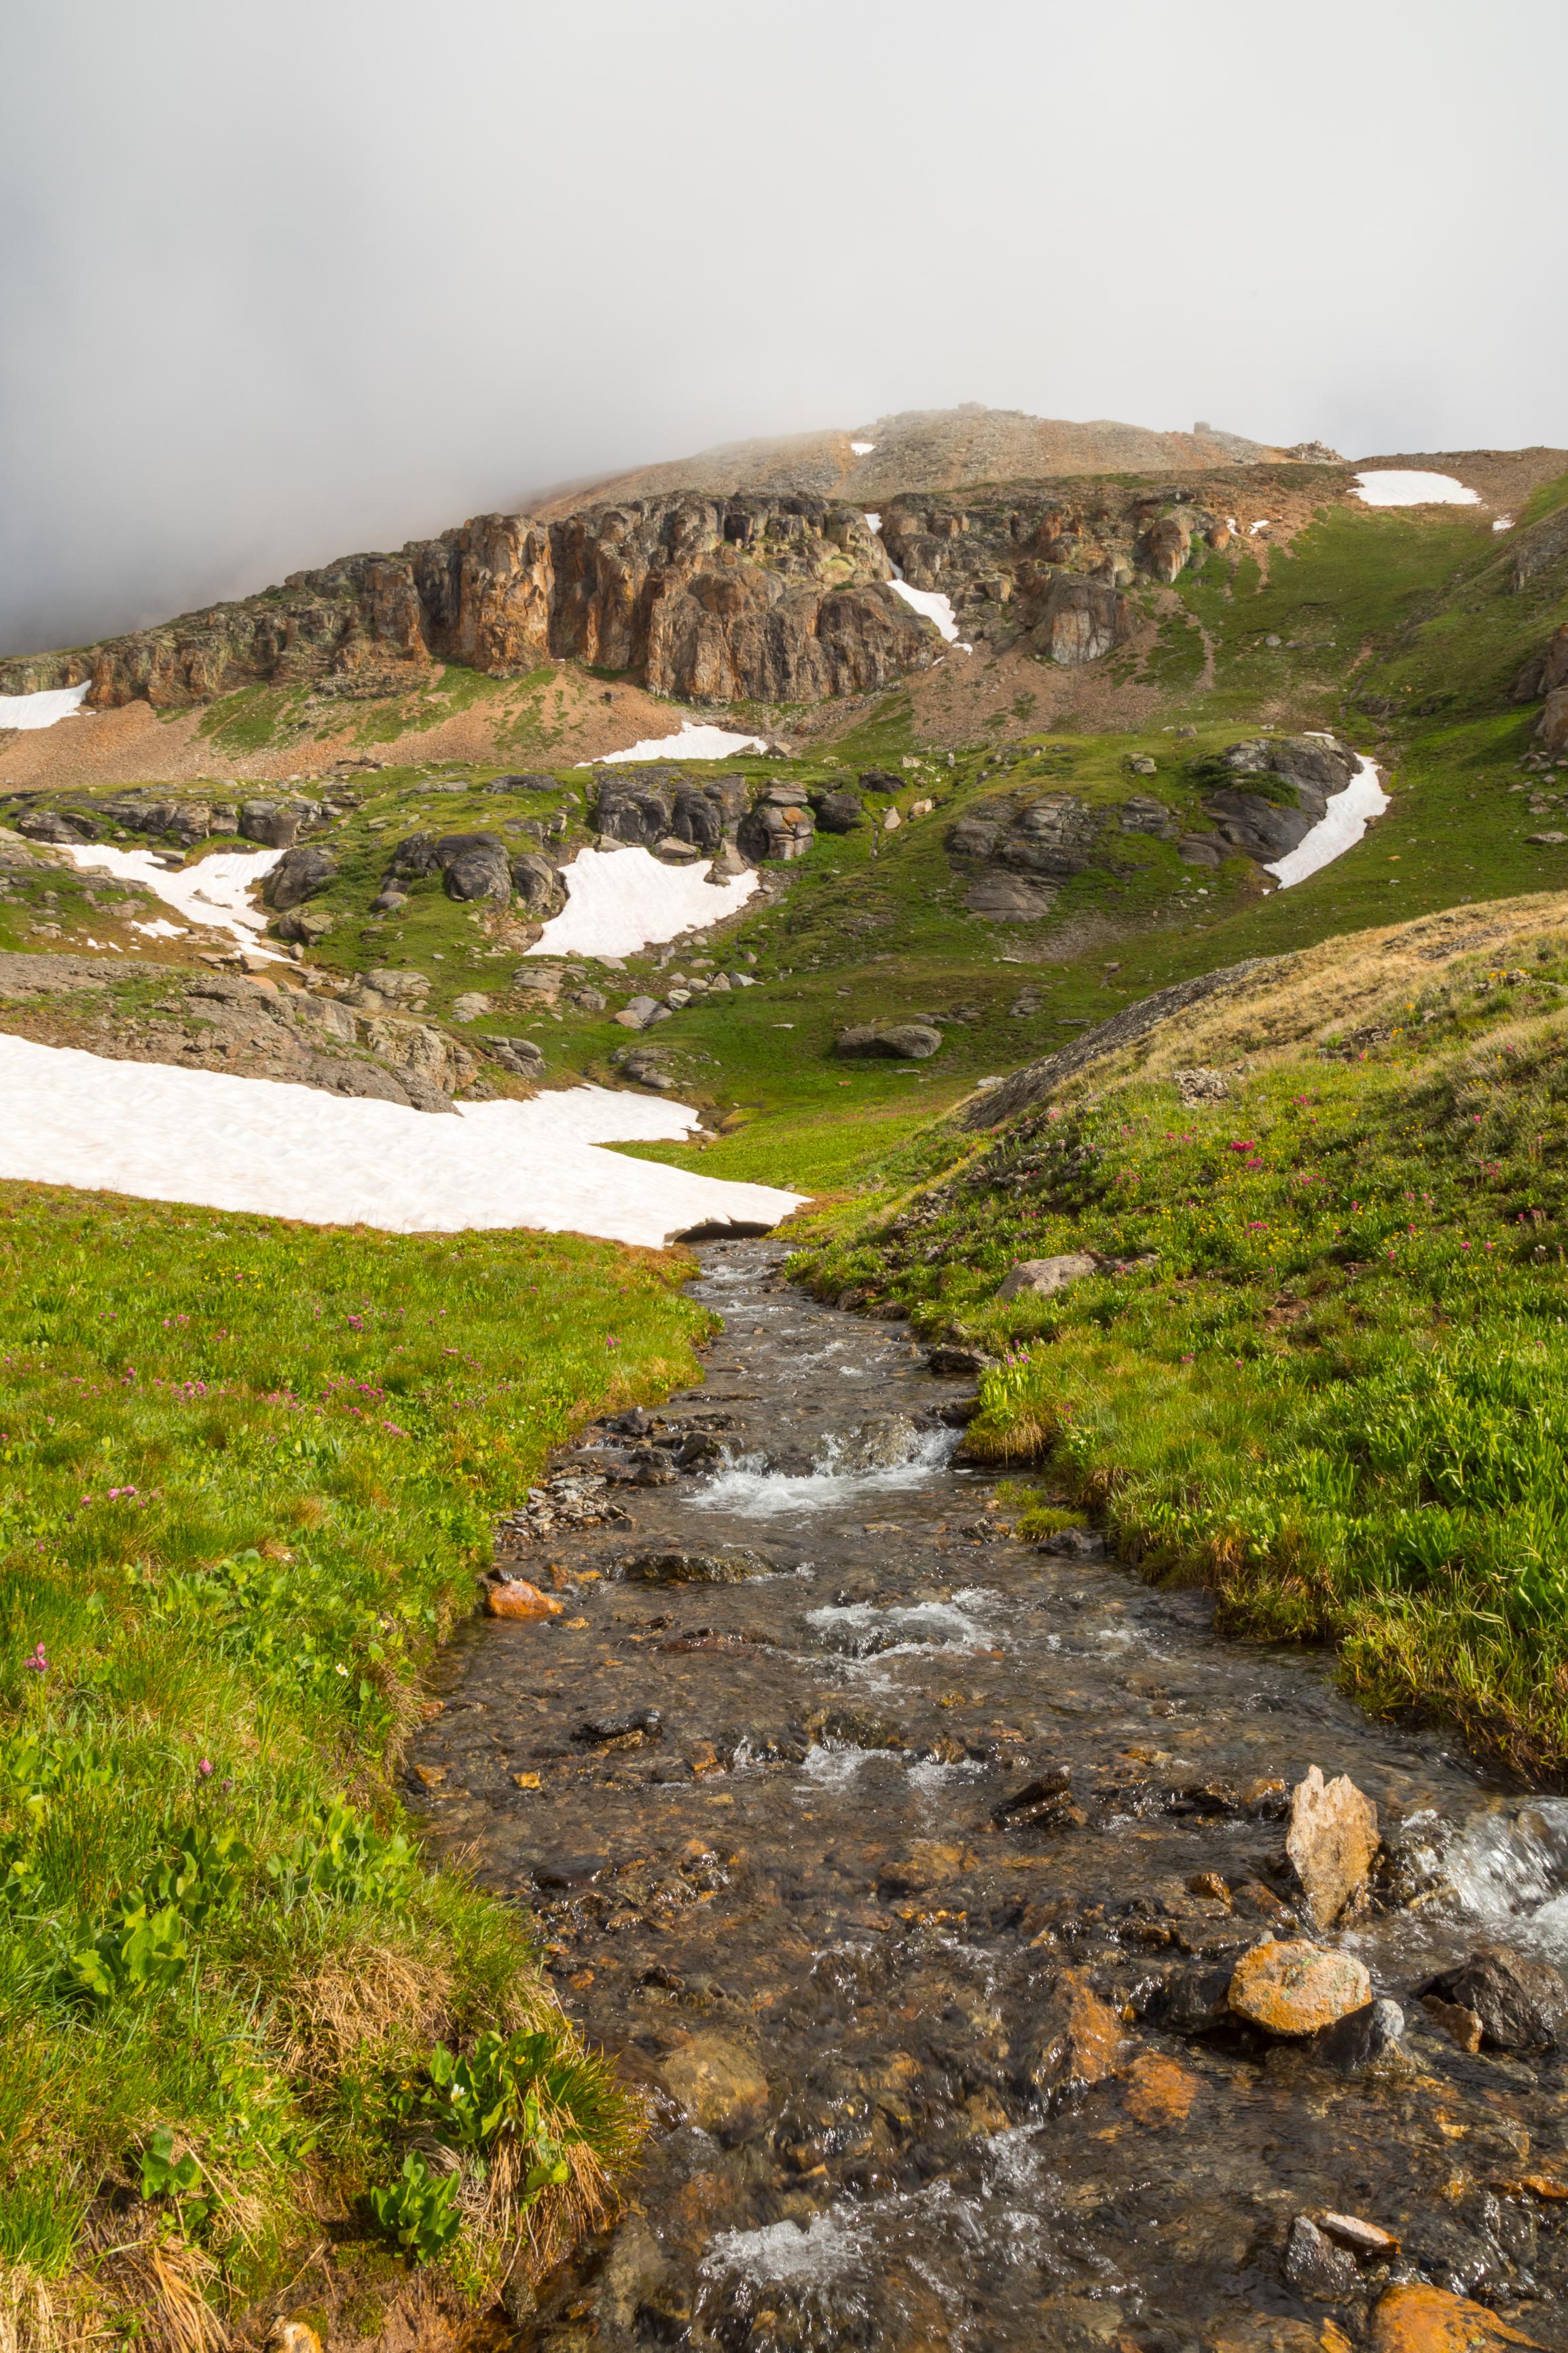 Porphyry Basin, Image # 72